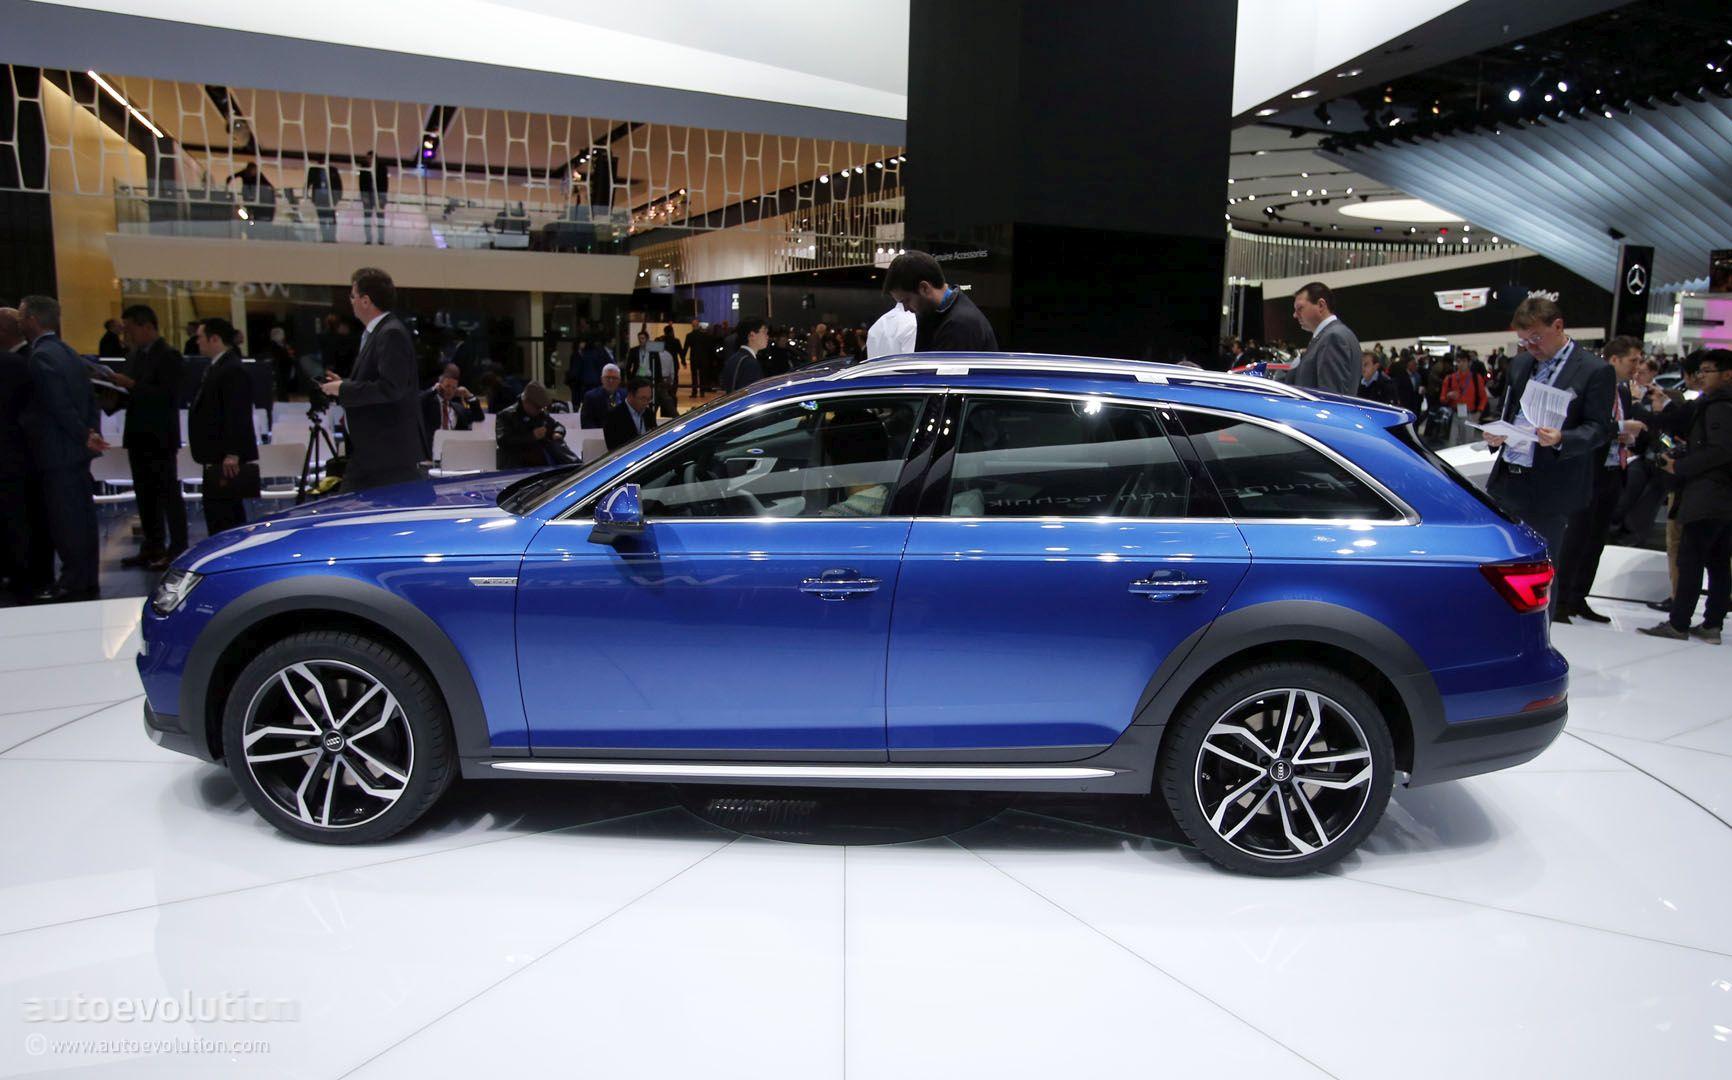 2017 Audi A4 Allroad Quattro In Detroit Side View